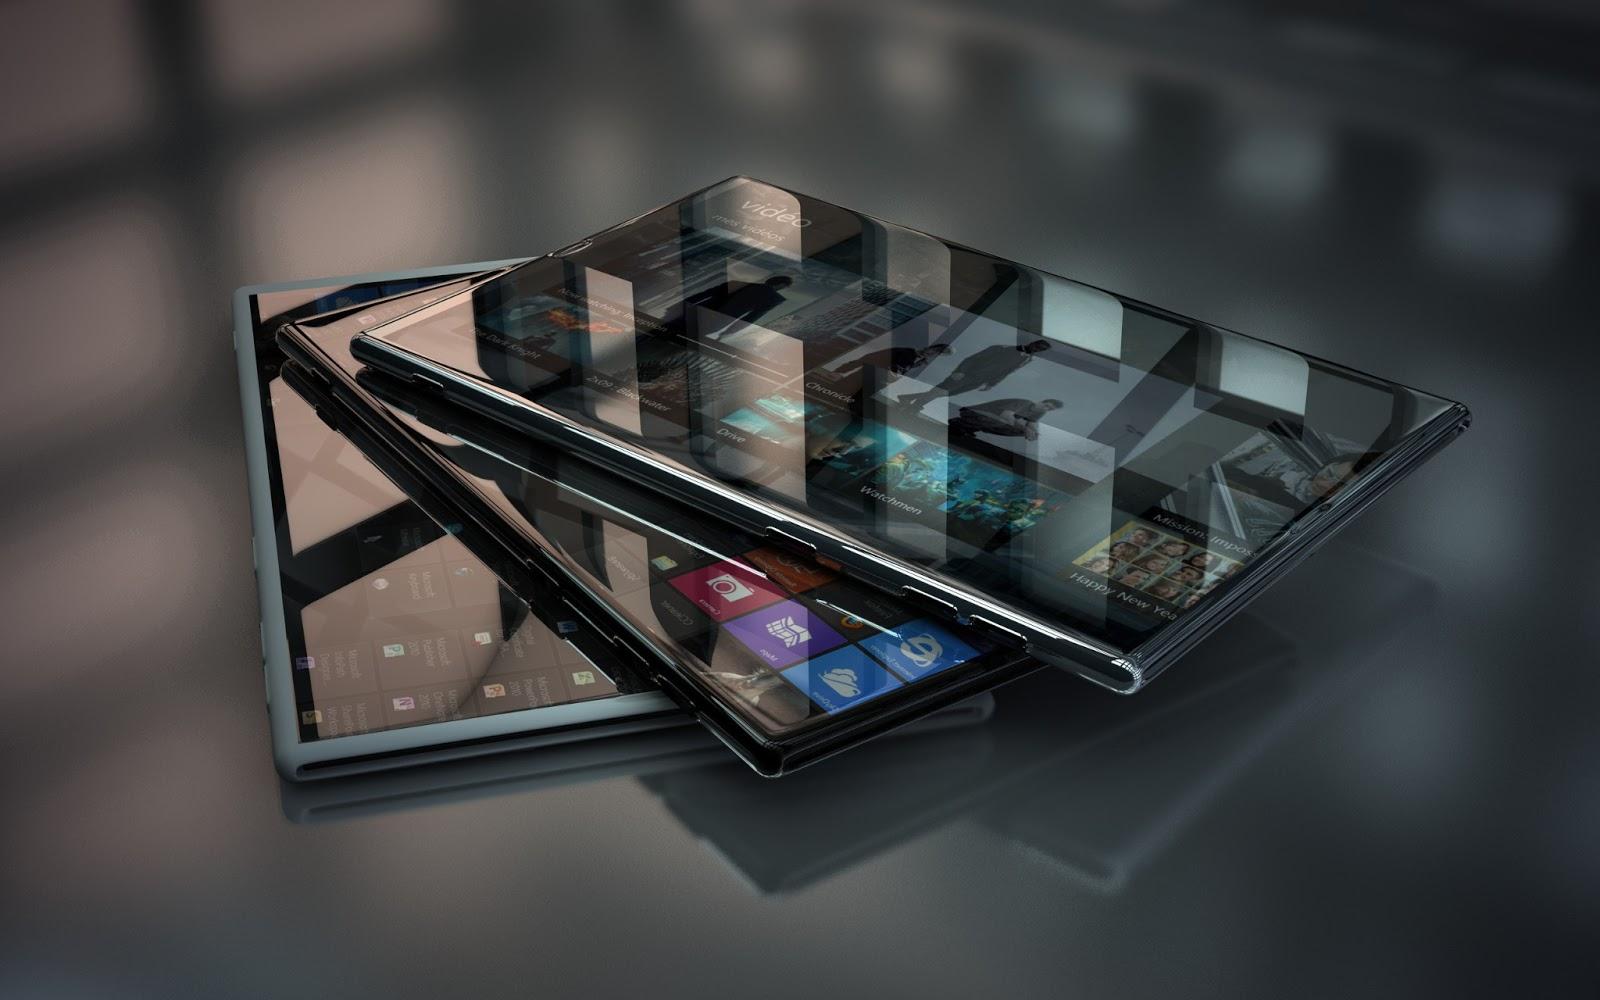 Glass 3D Hi Tech Windows 8 Phone Desktop Wallpapers and Backgrounds 1600x1000